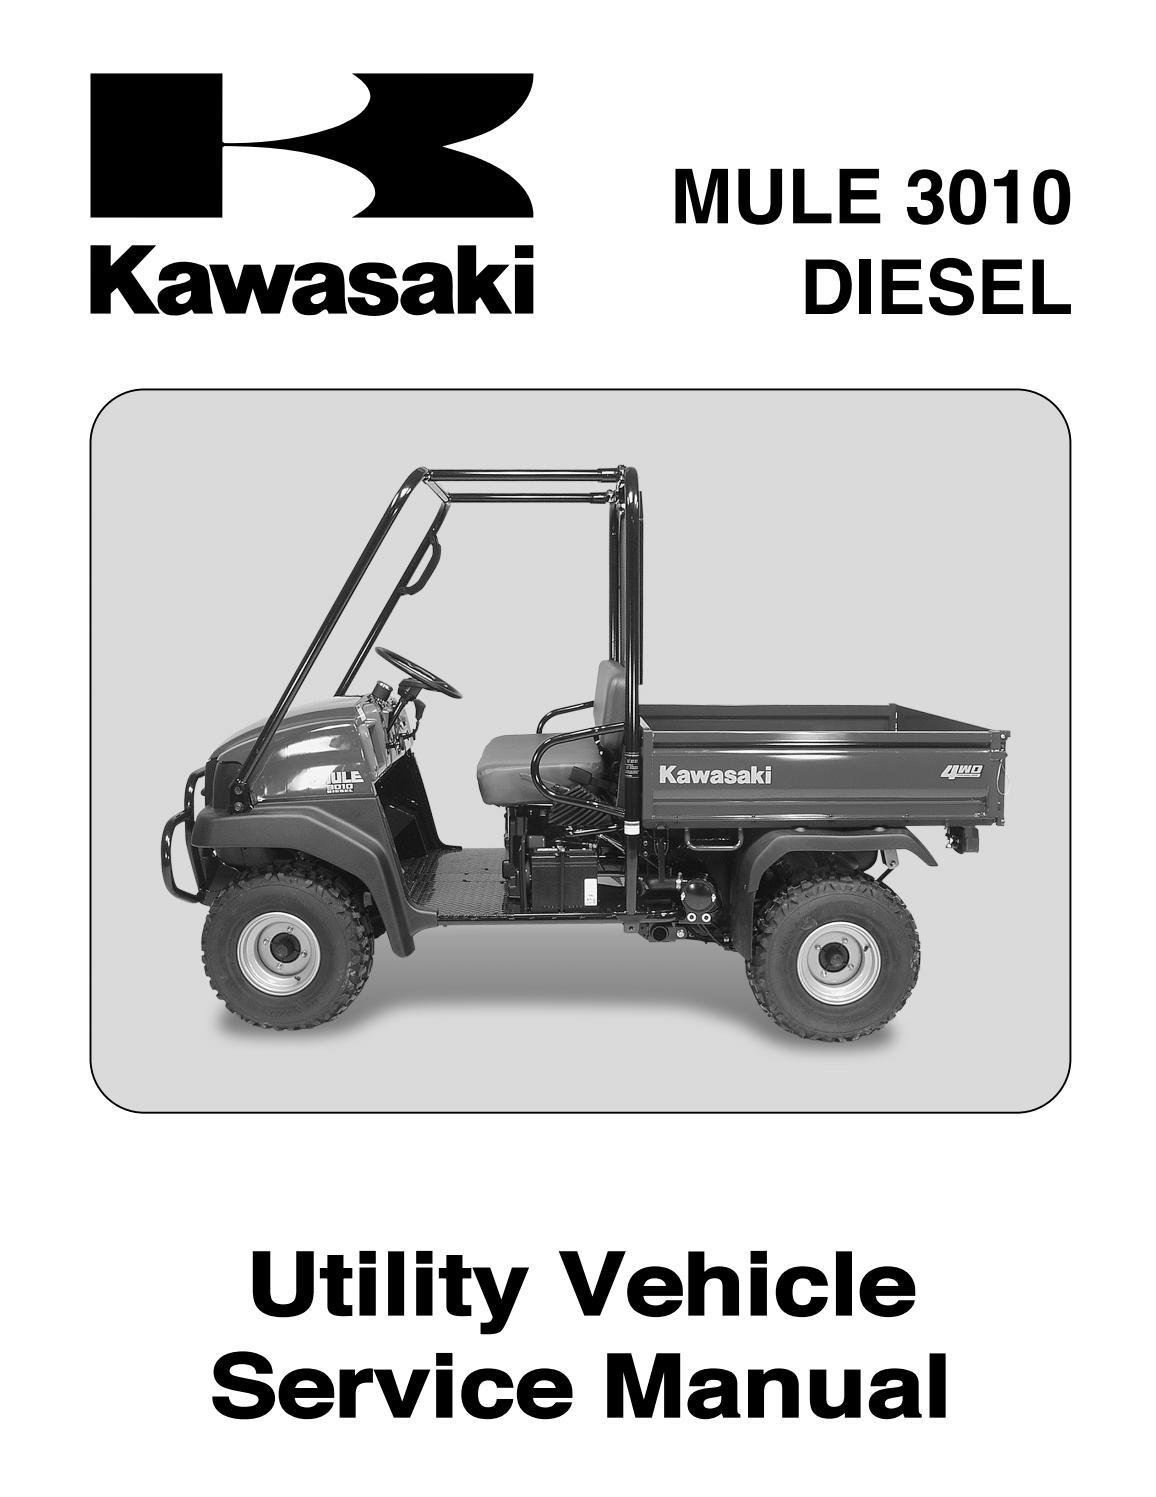 Kawasaki Mule 3010 Diesel Oil Filter